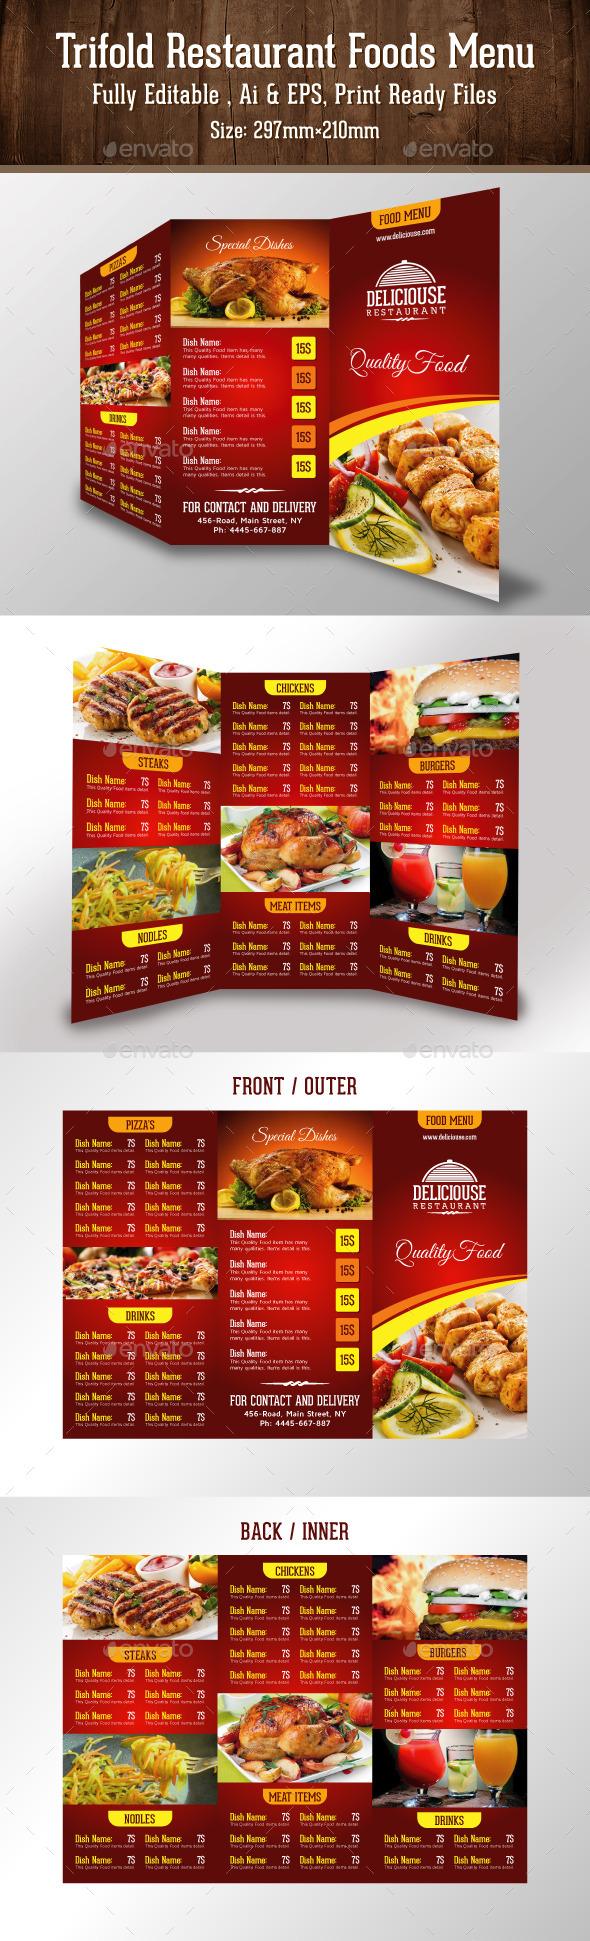 Trifold Restaurant Foods Menu - Food Menus Print Templates